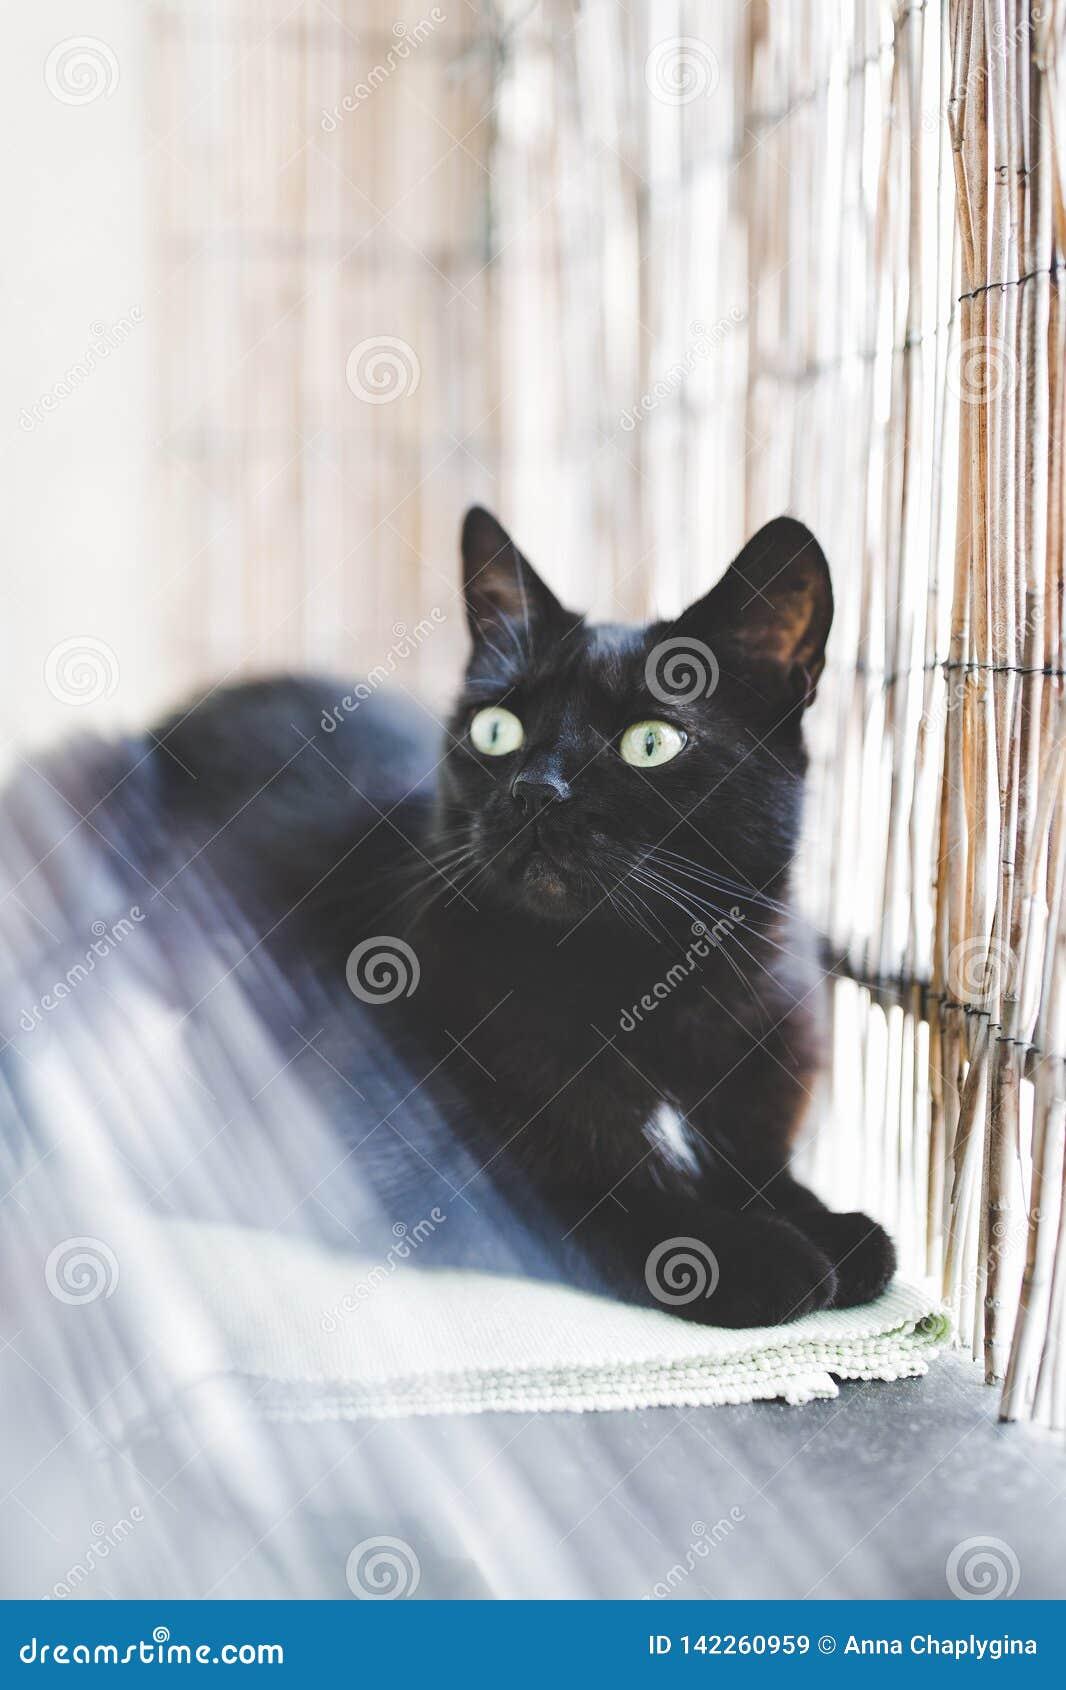 Black domestic cat enjoying morning sunlight. Selective focus